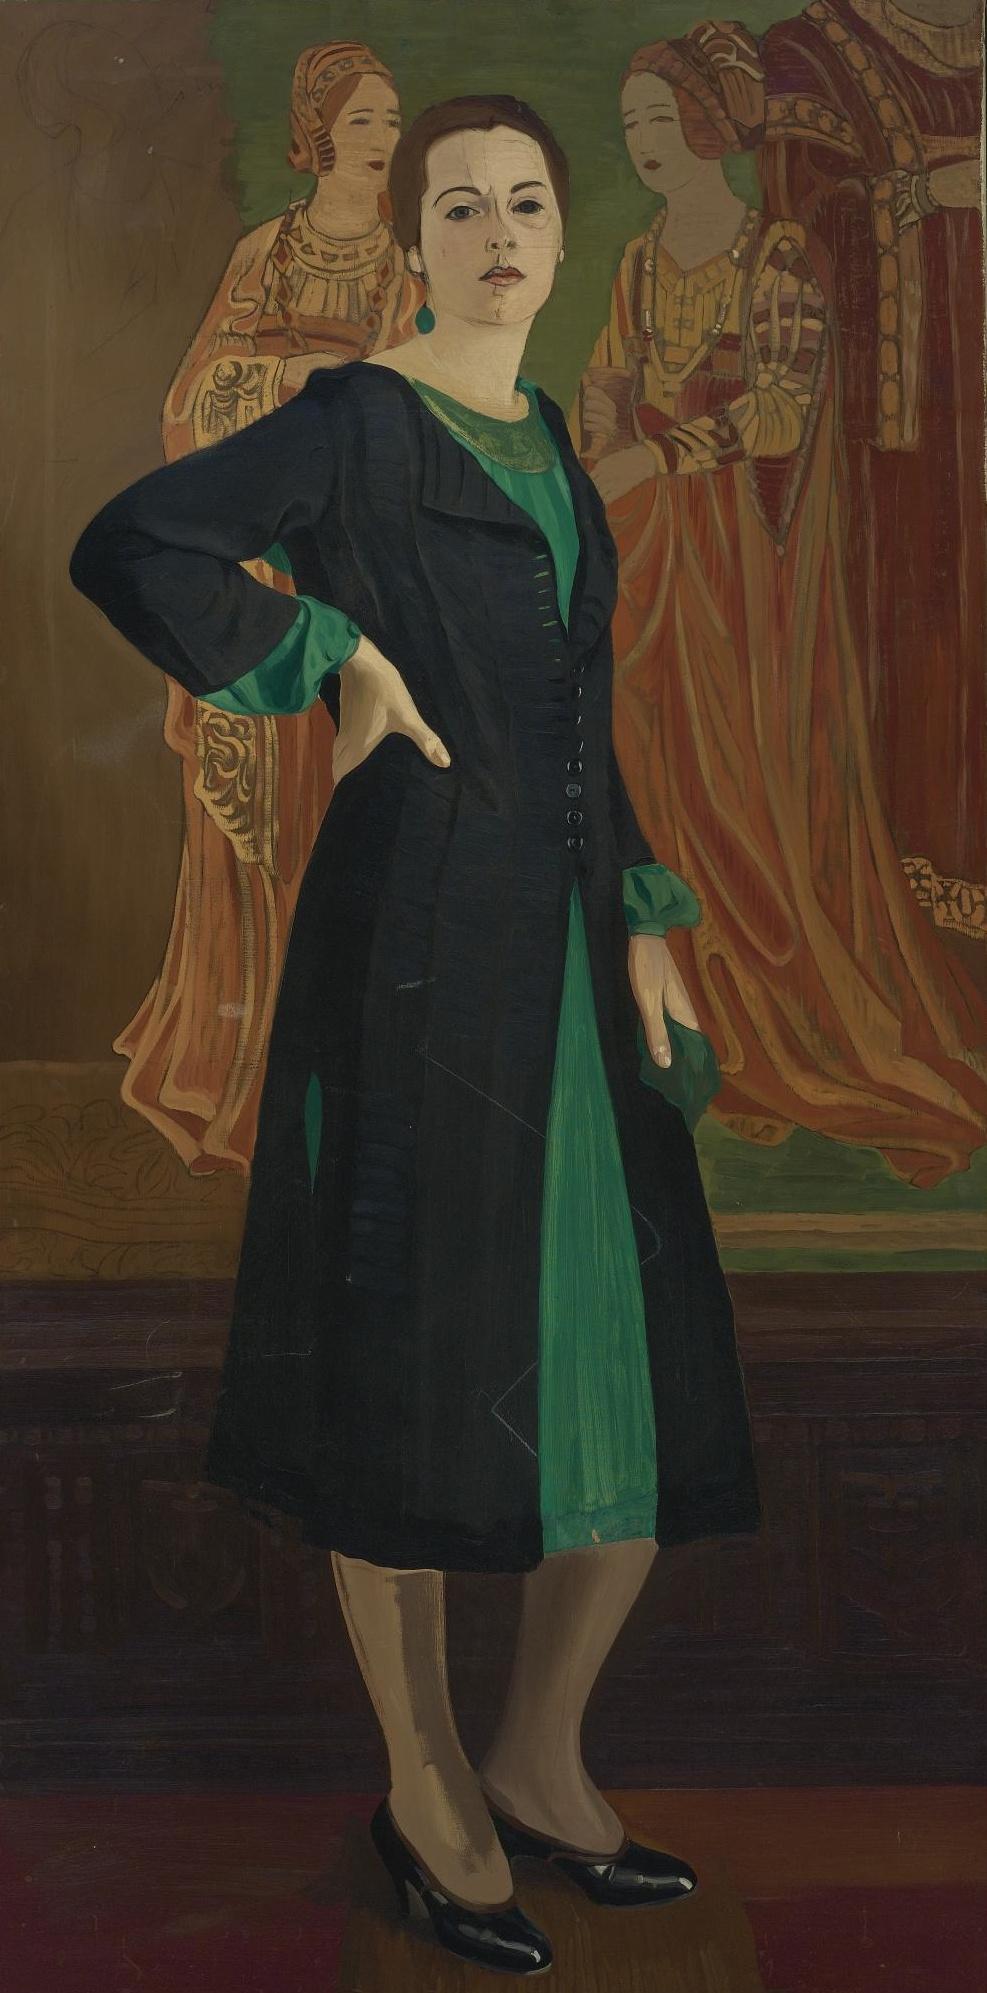 Svyatoslav Nikolaevich Roerich. Katherine Campbell in a green dress